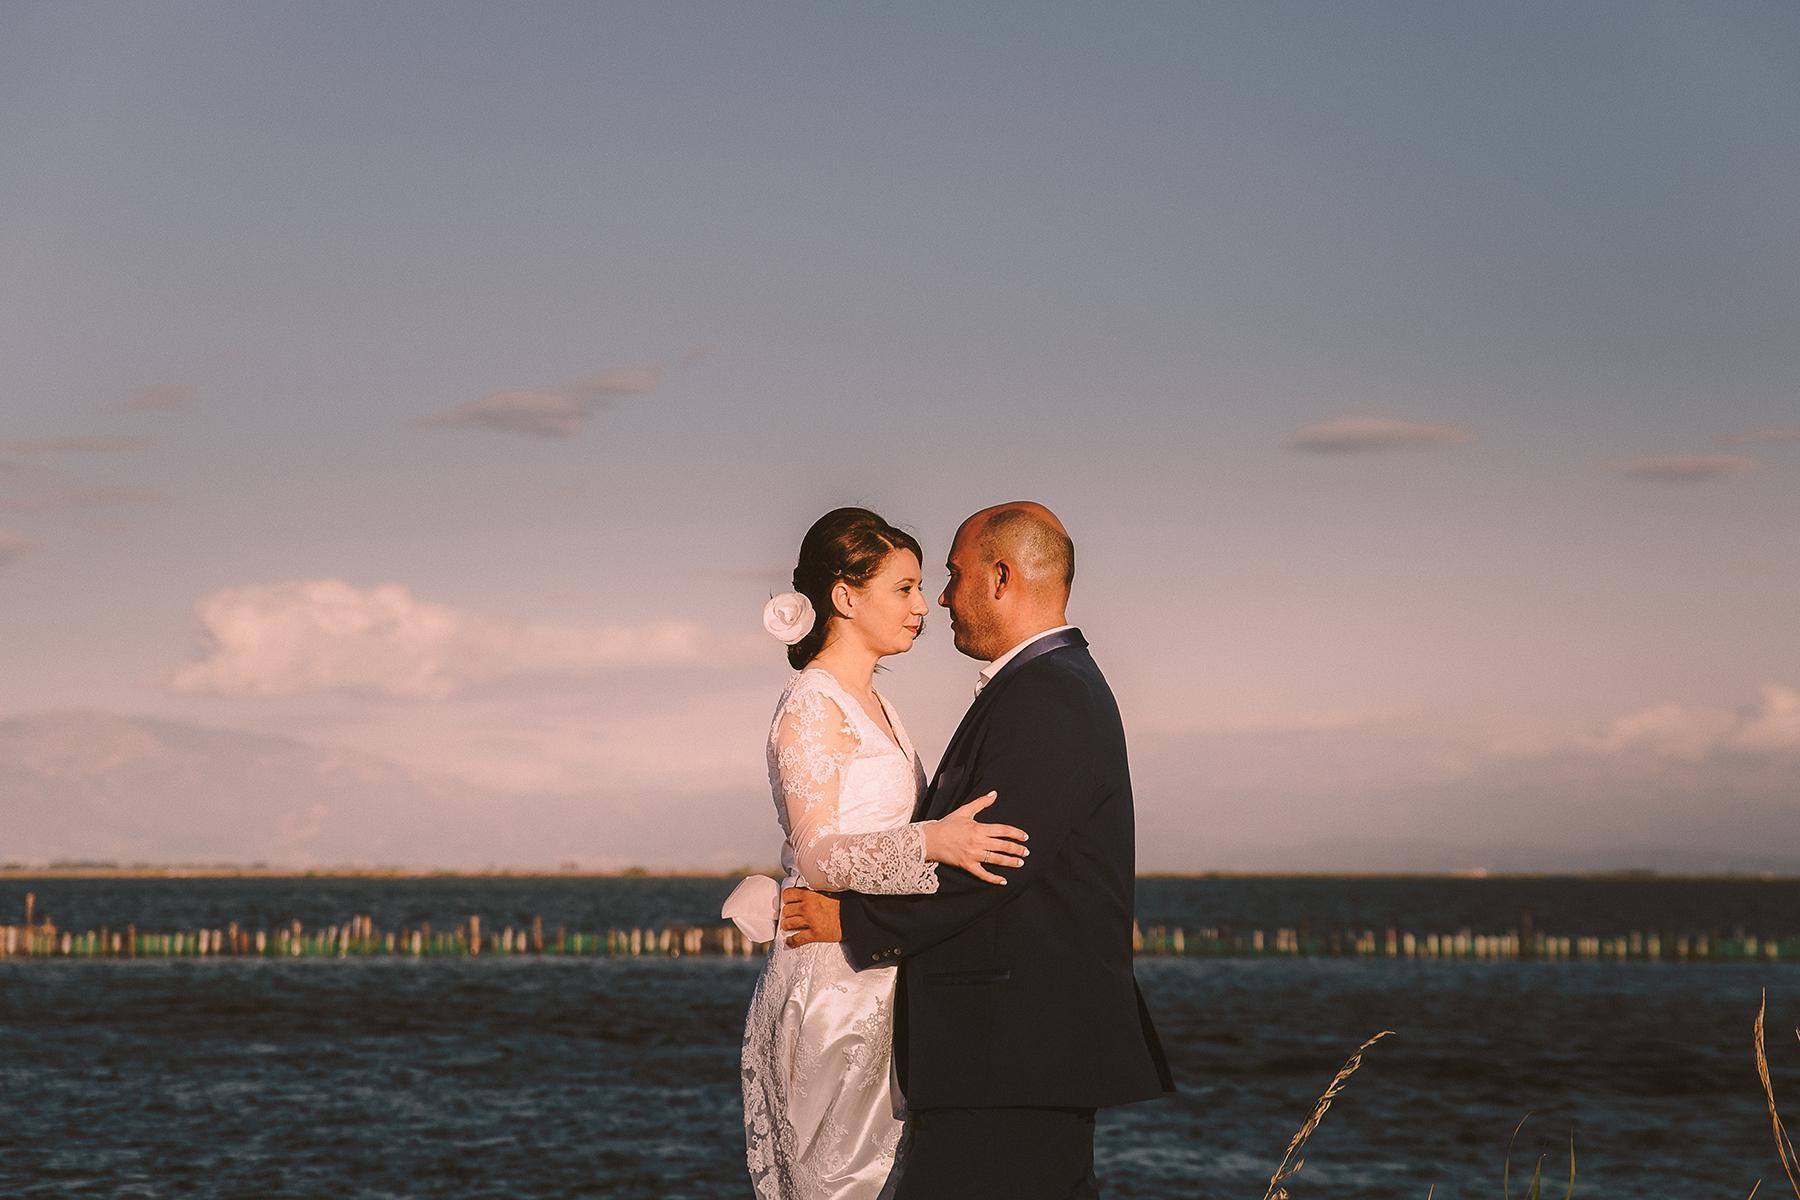 destination-wedding-in-lake-aitoliko-messolonghi-in-greece085